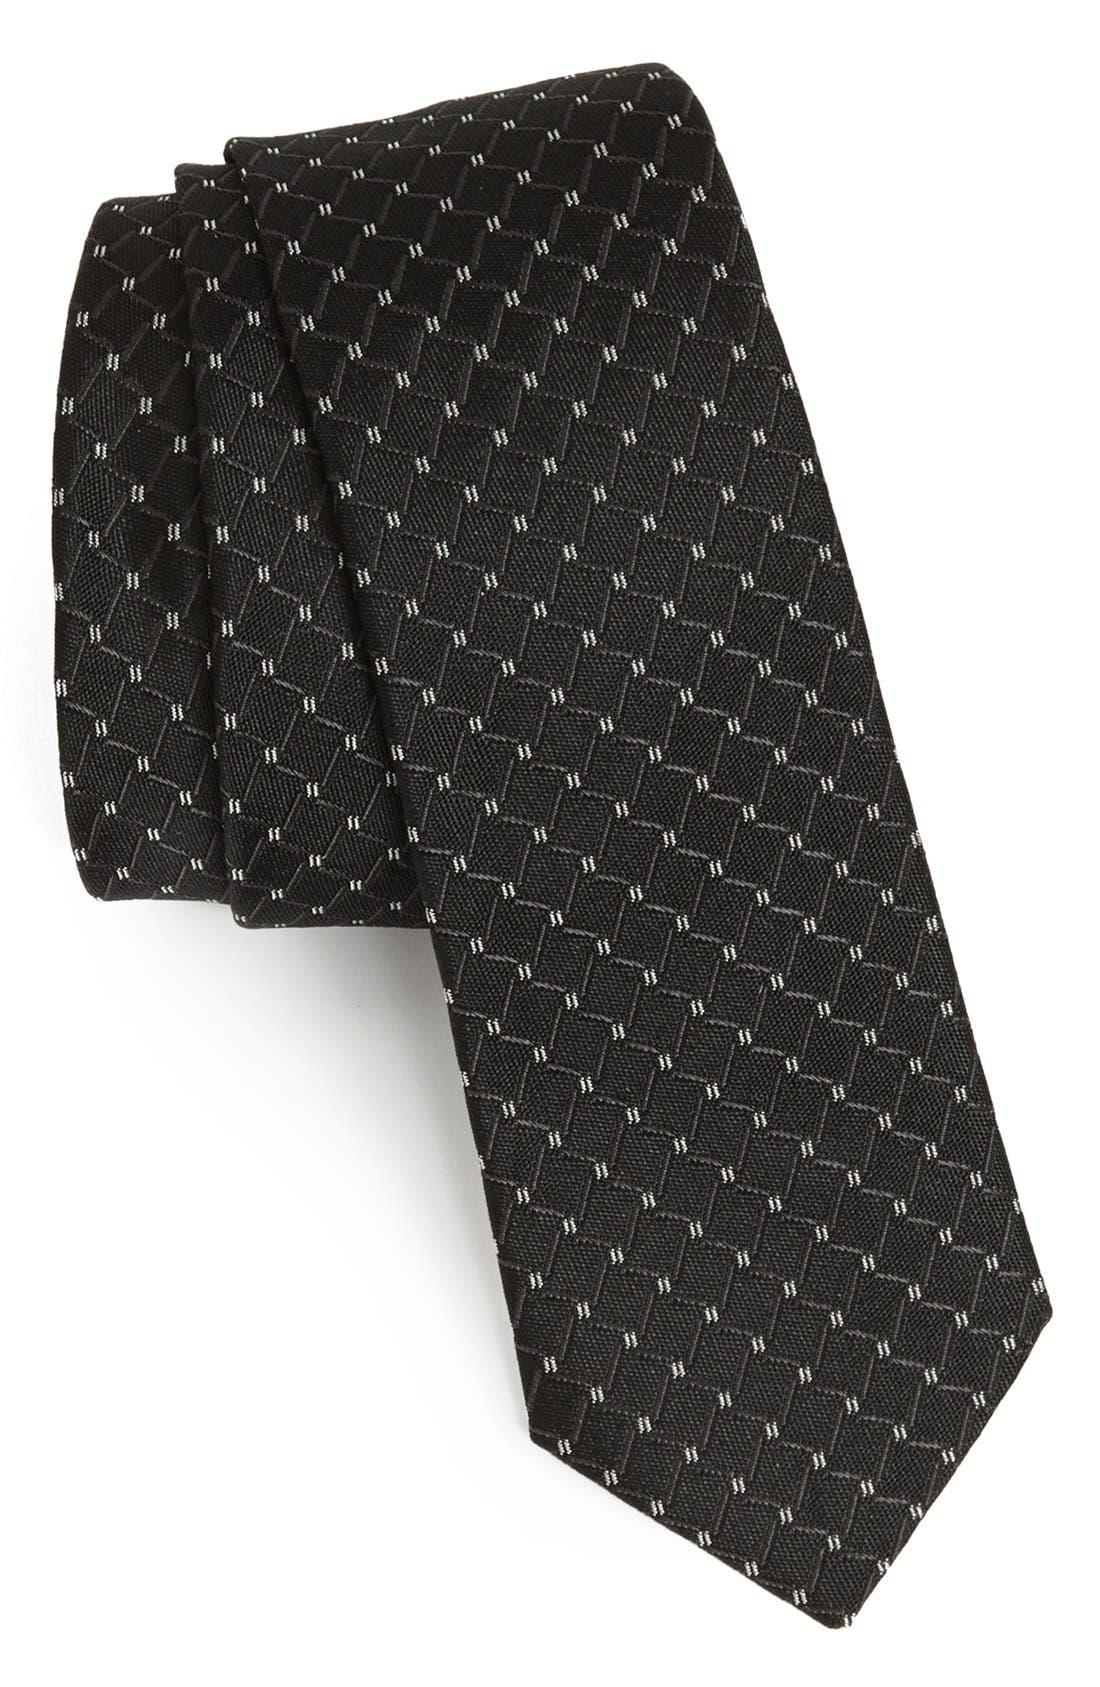 Main Image - Dolce&Gabbana Martini Weave Silk Tie